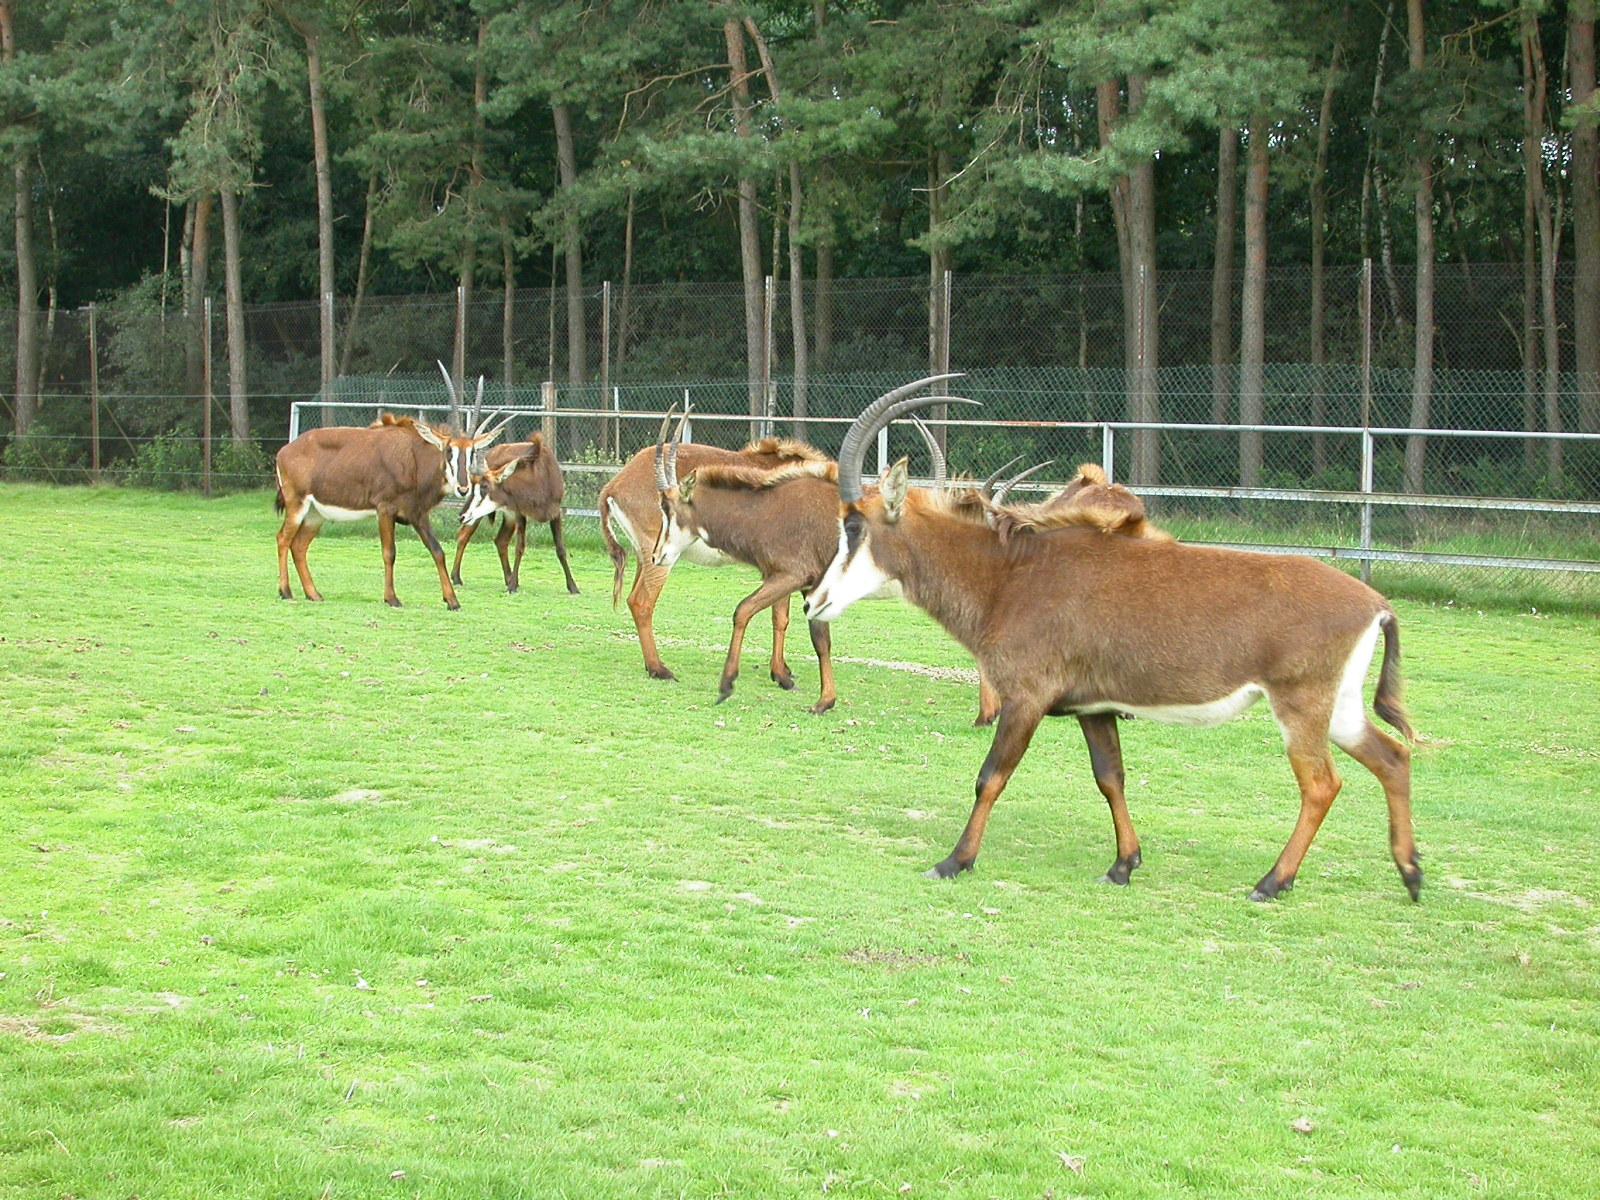 eva sort of deers interlopes horns